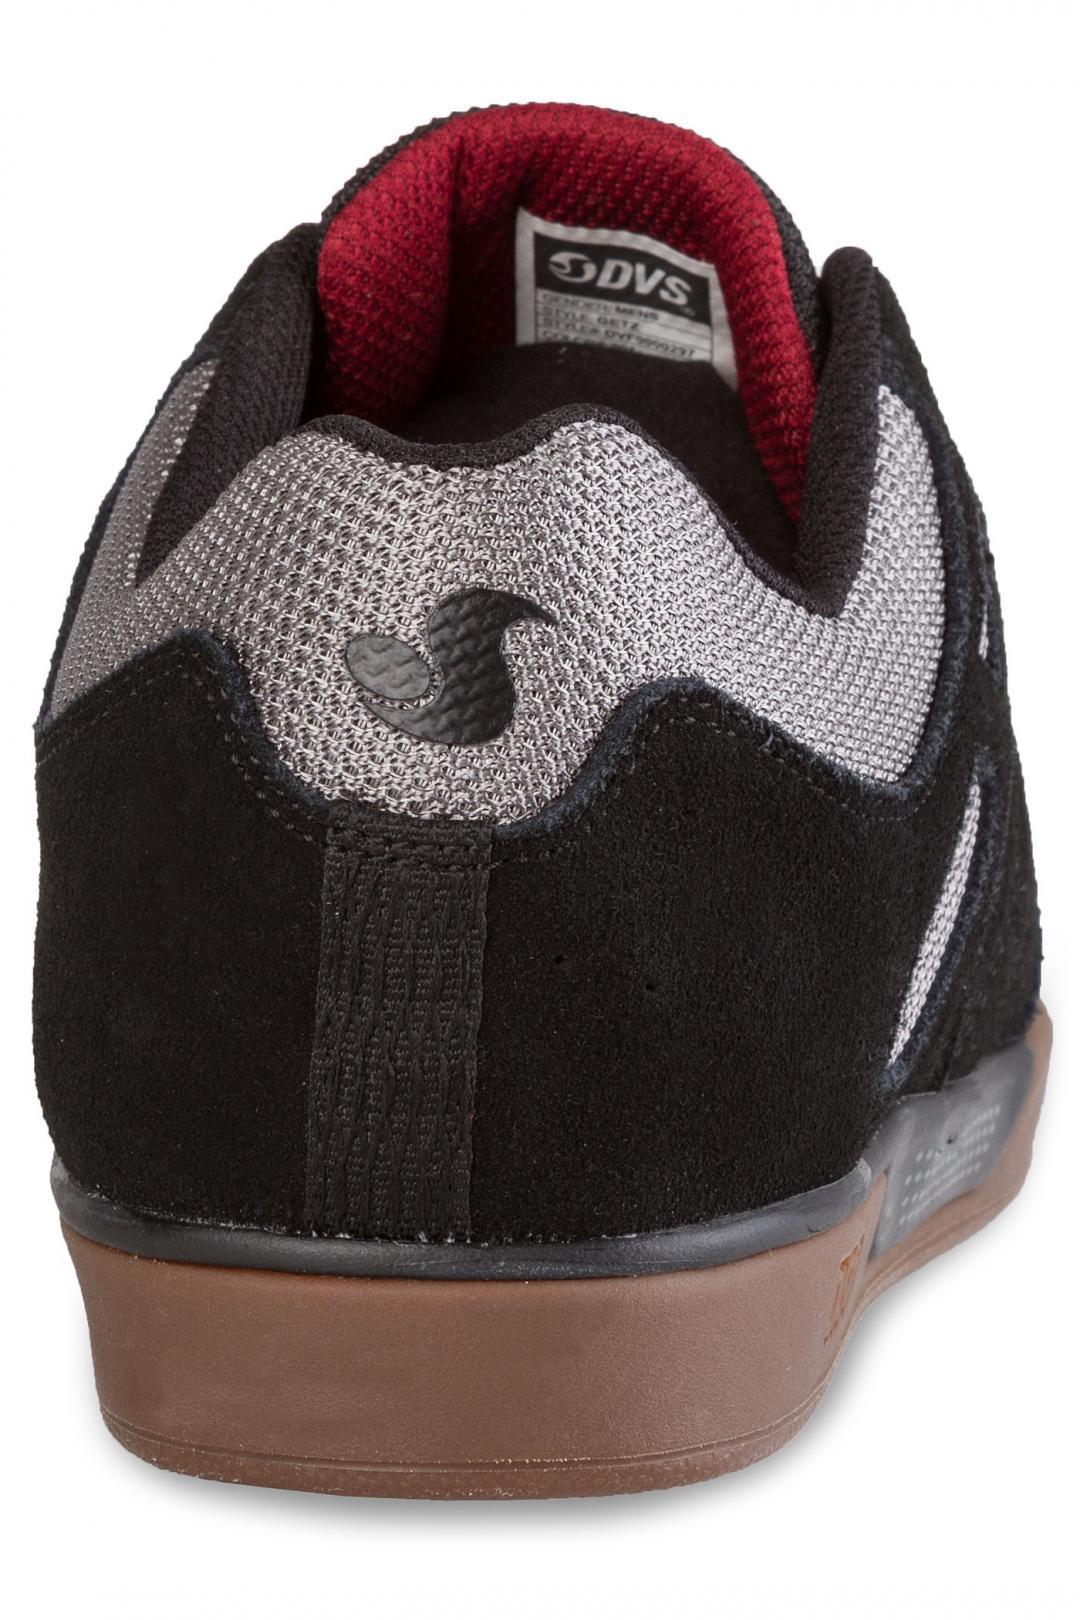 Uomo DVS Getz Suede black gum | Sneaker